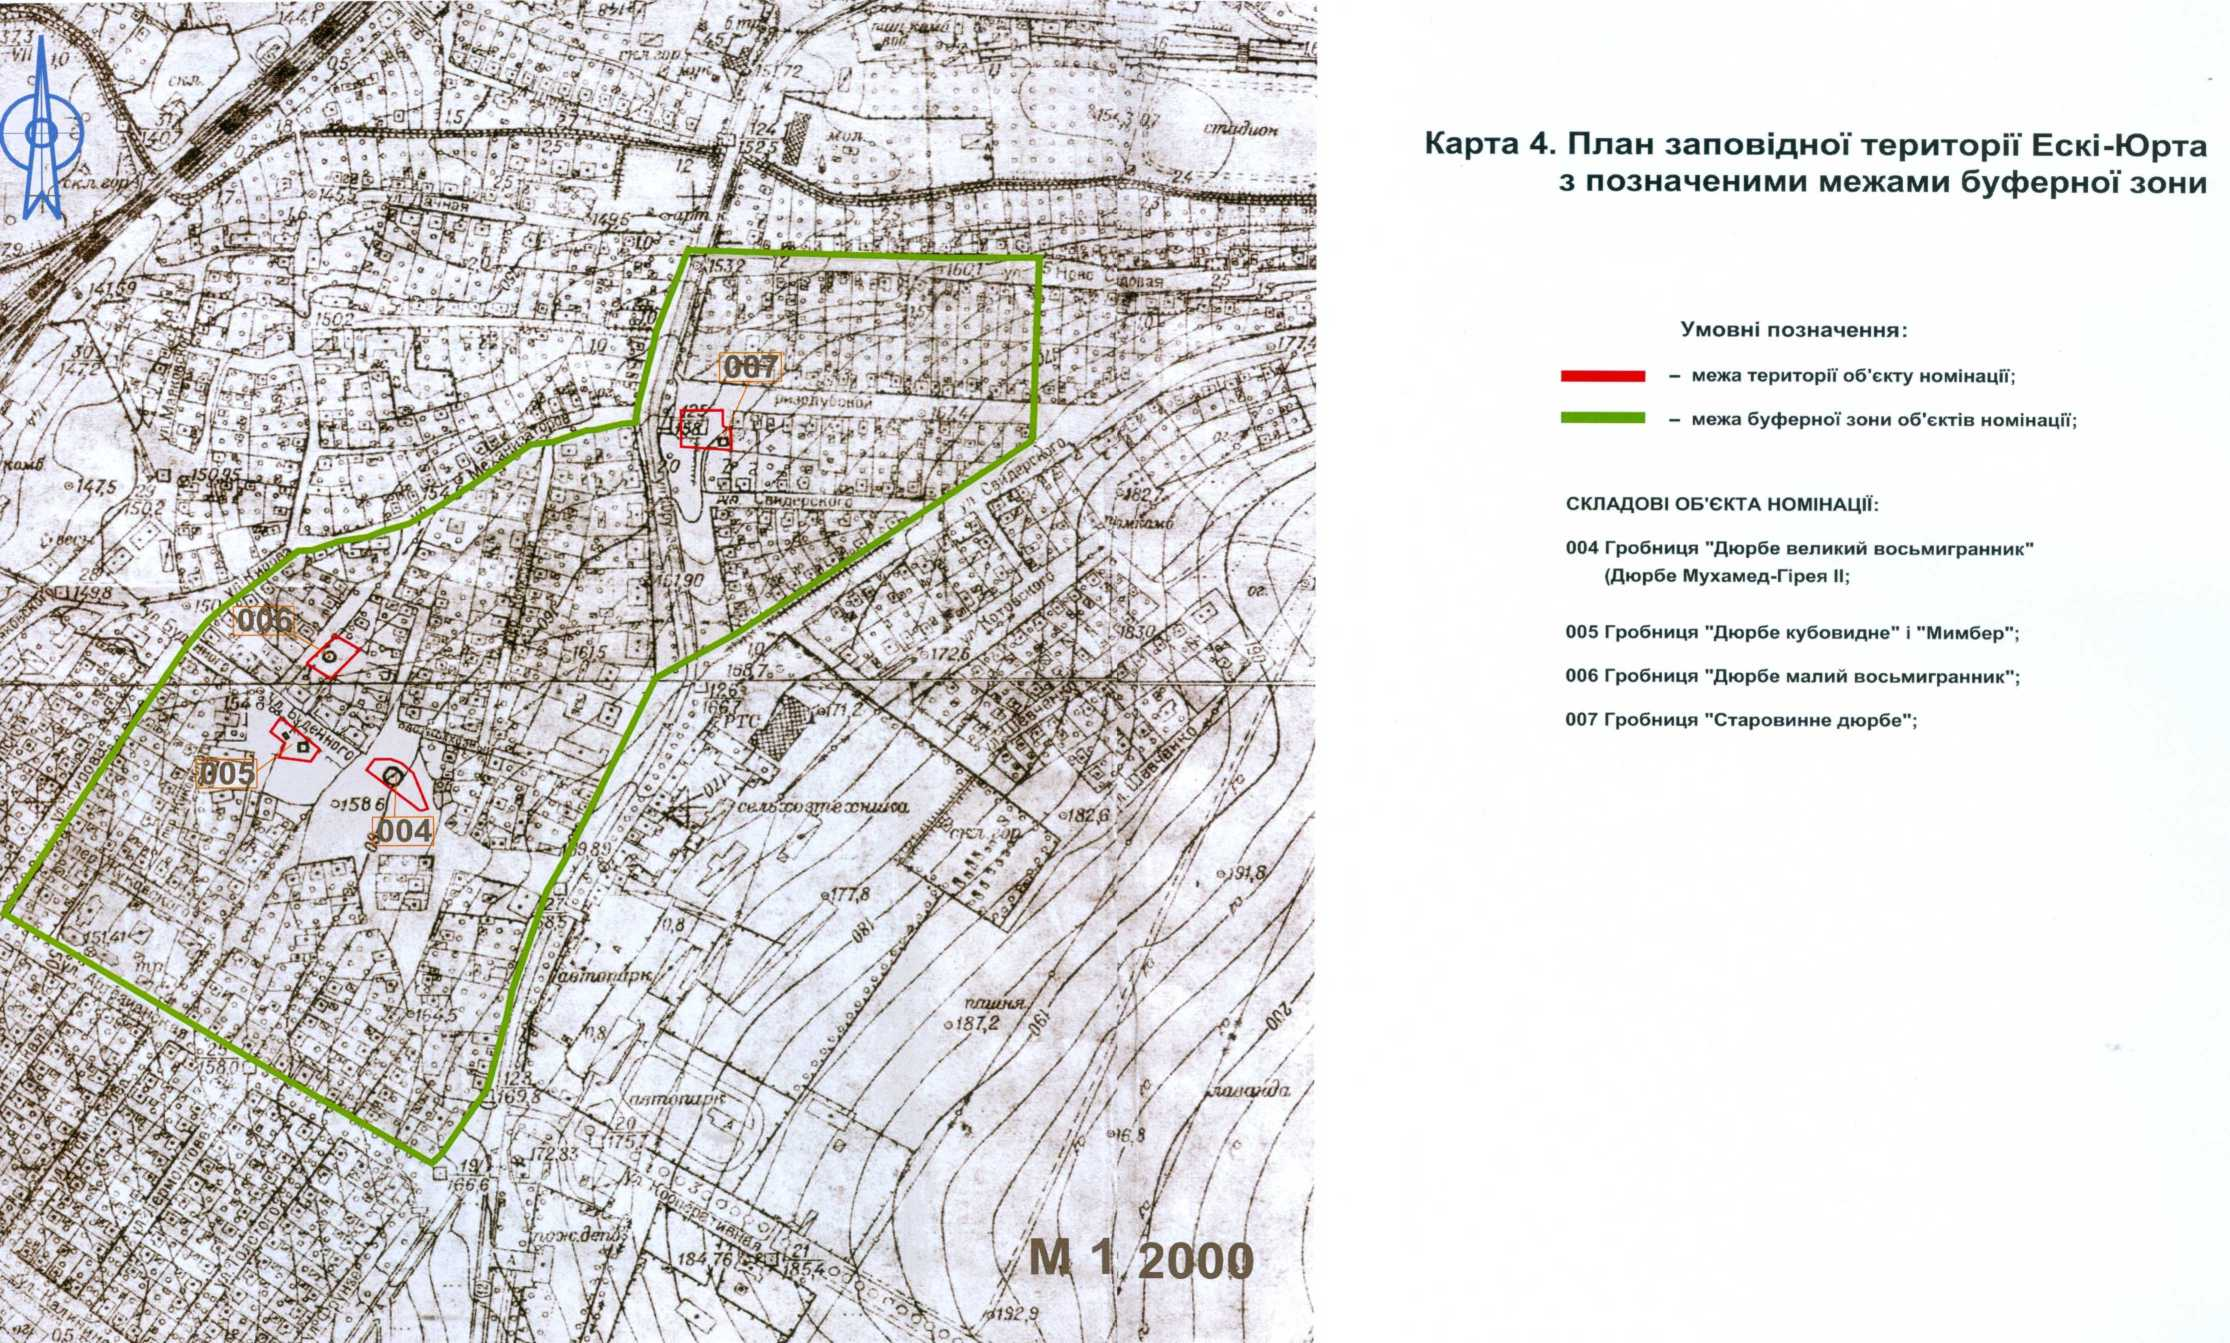 2014 р. Картосхема пам'яток Ескі-Юрта